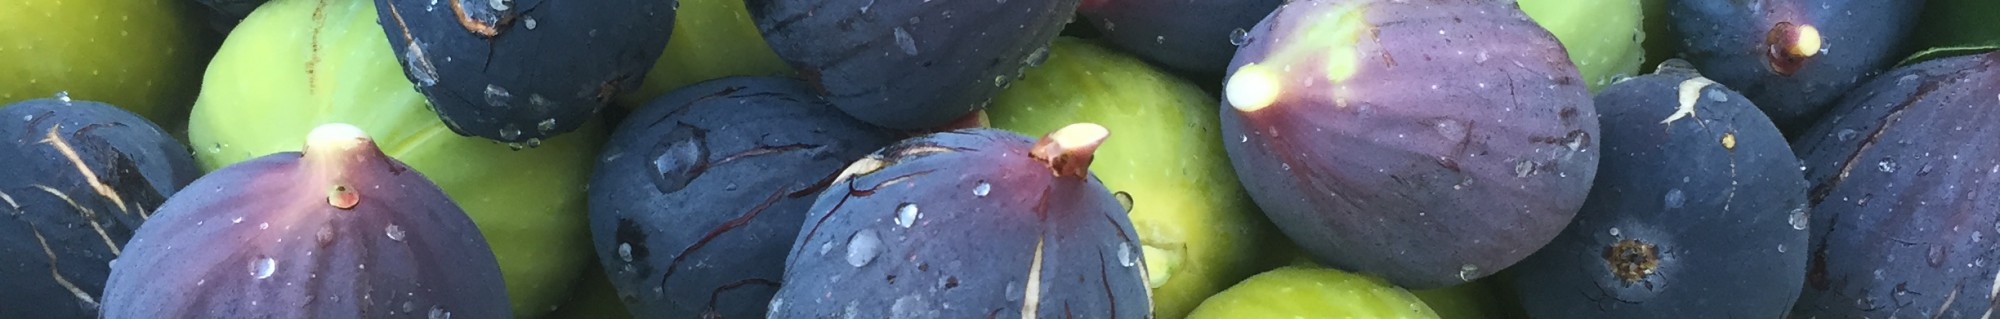 ¨organic & plant based cuisine ¨